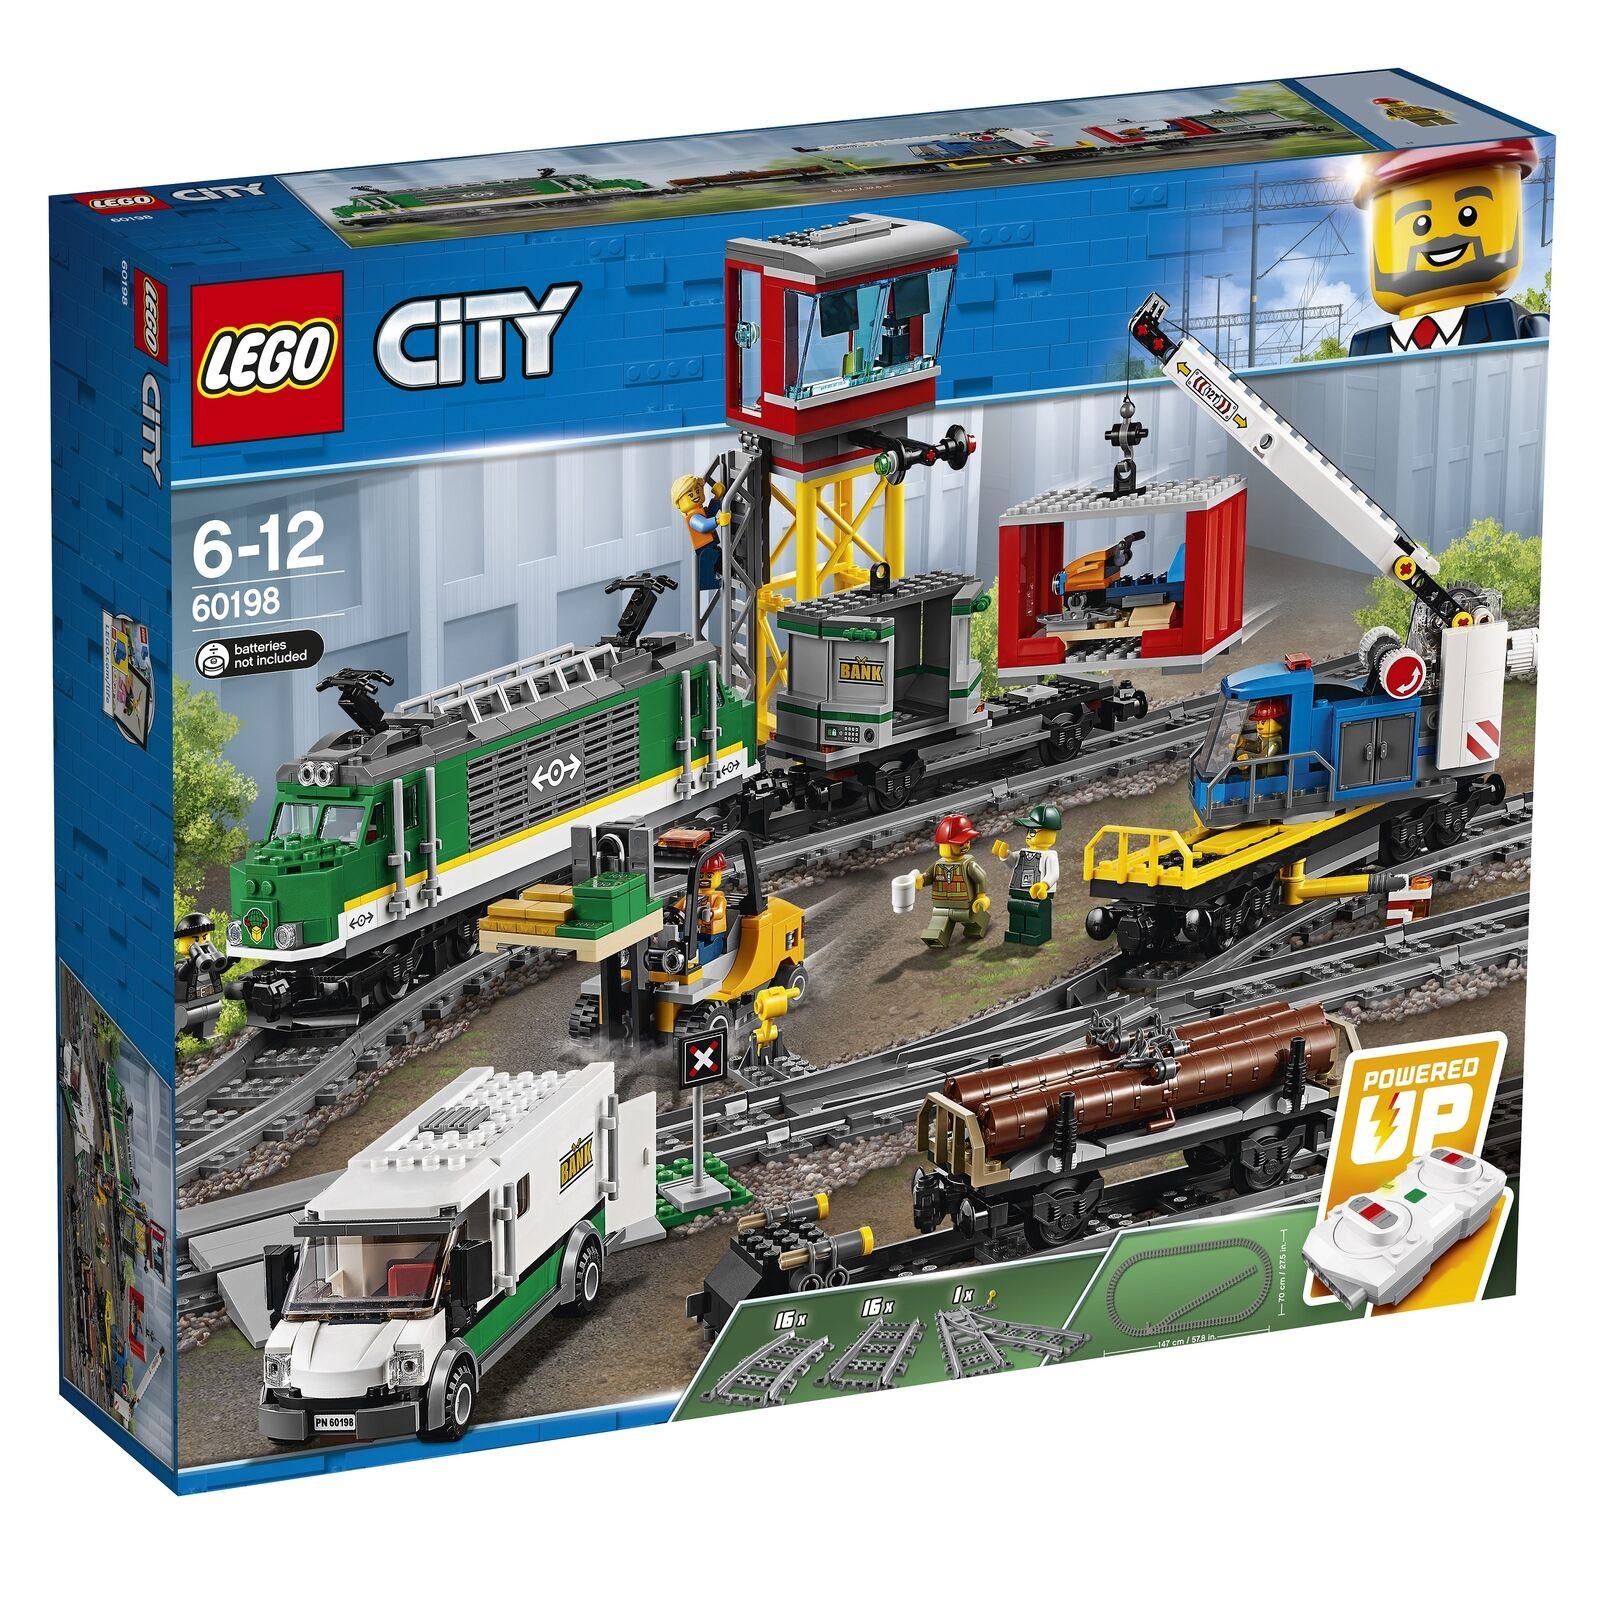 Lego City Cargo Train SET 60198 - 1000+ PIECES NEW